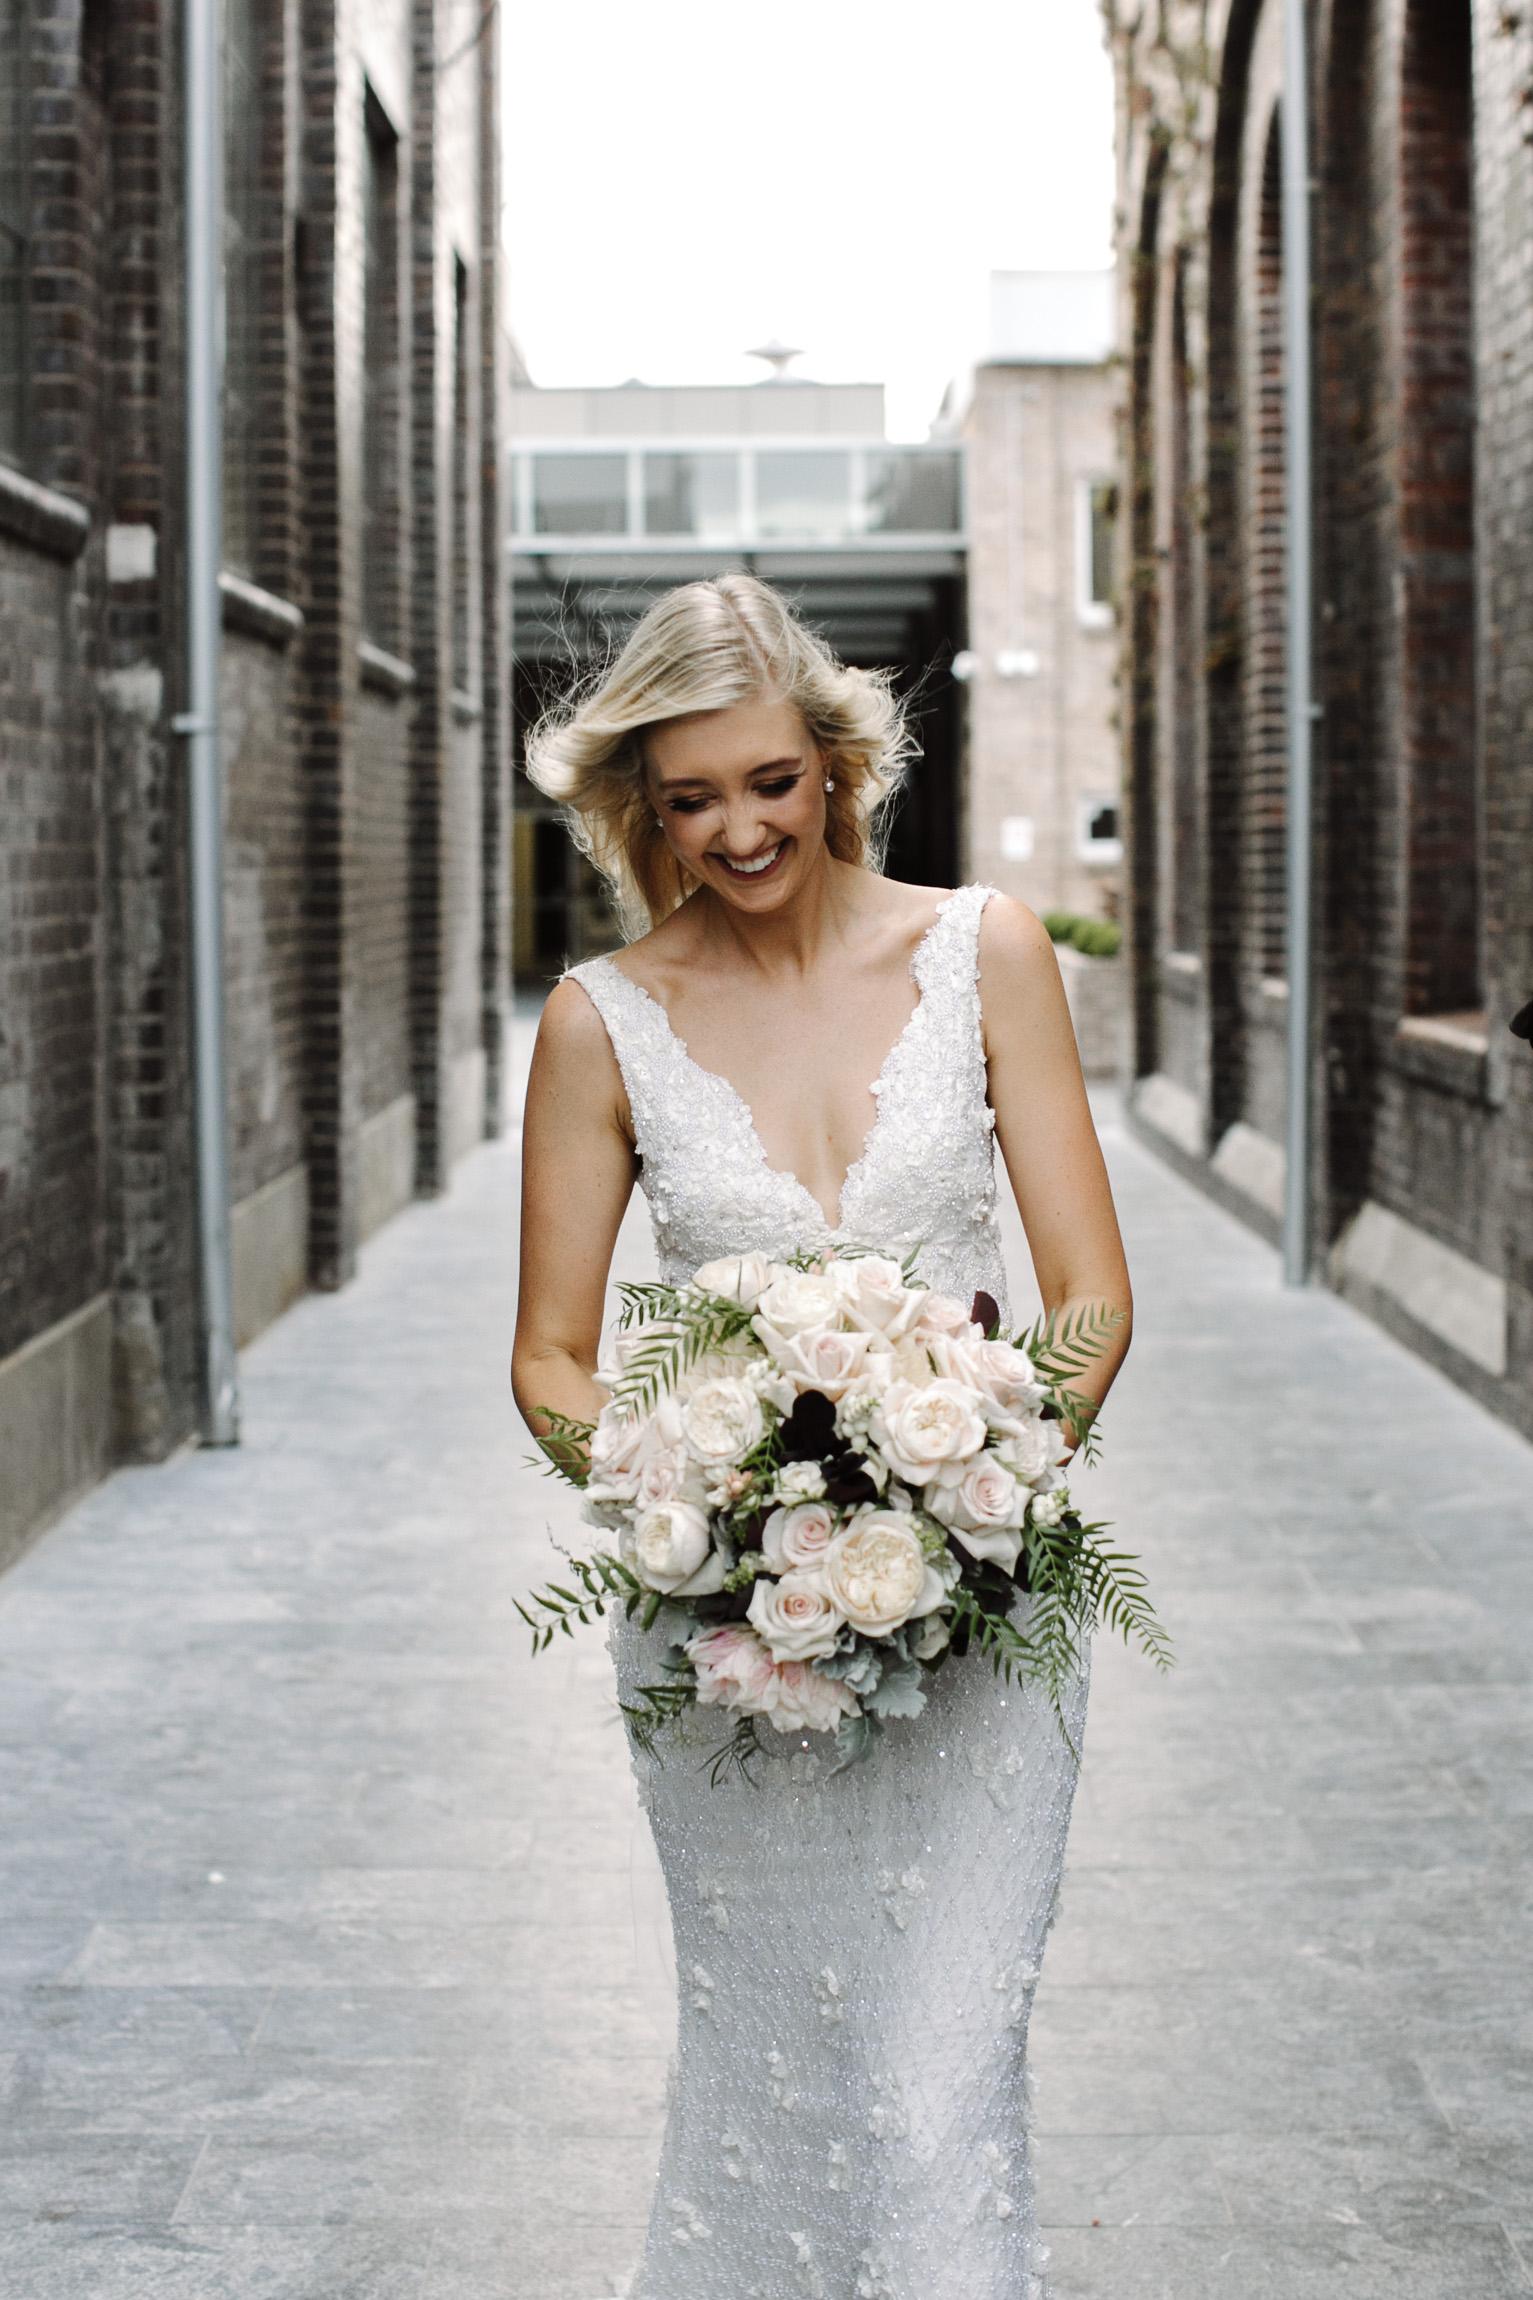 180223_justinaaron_wedding_charlotte_david_h-180.jpg